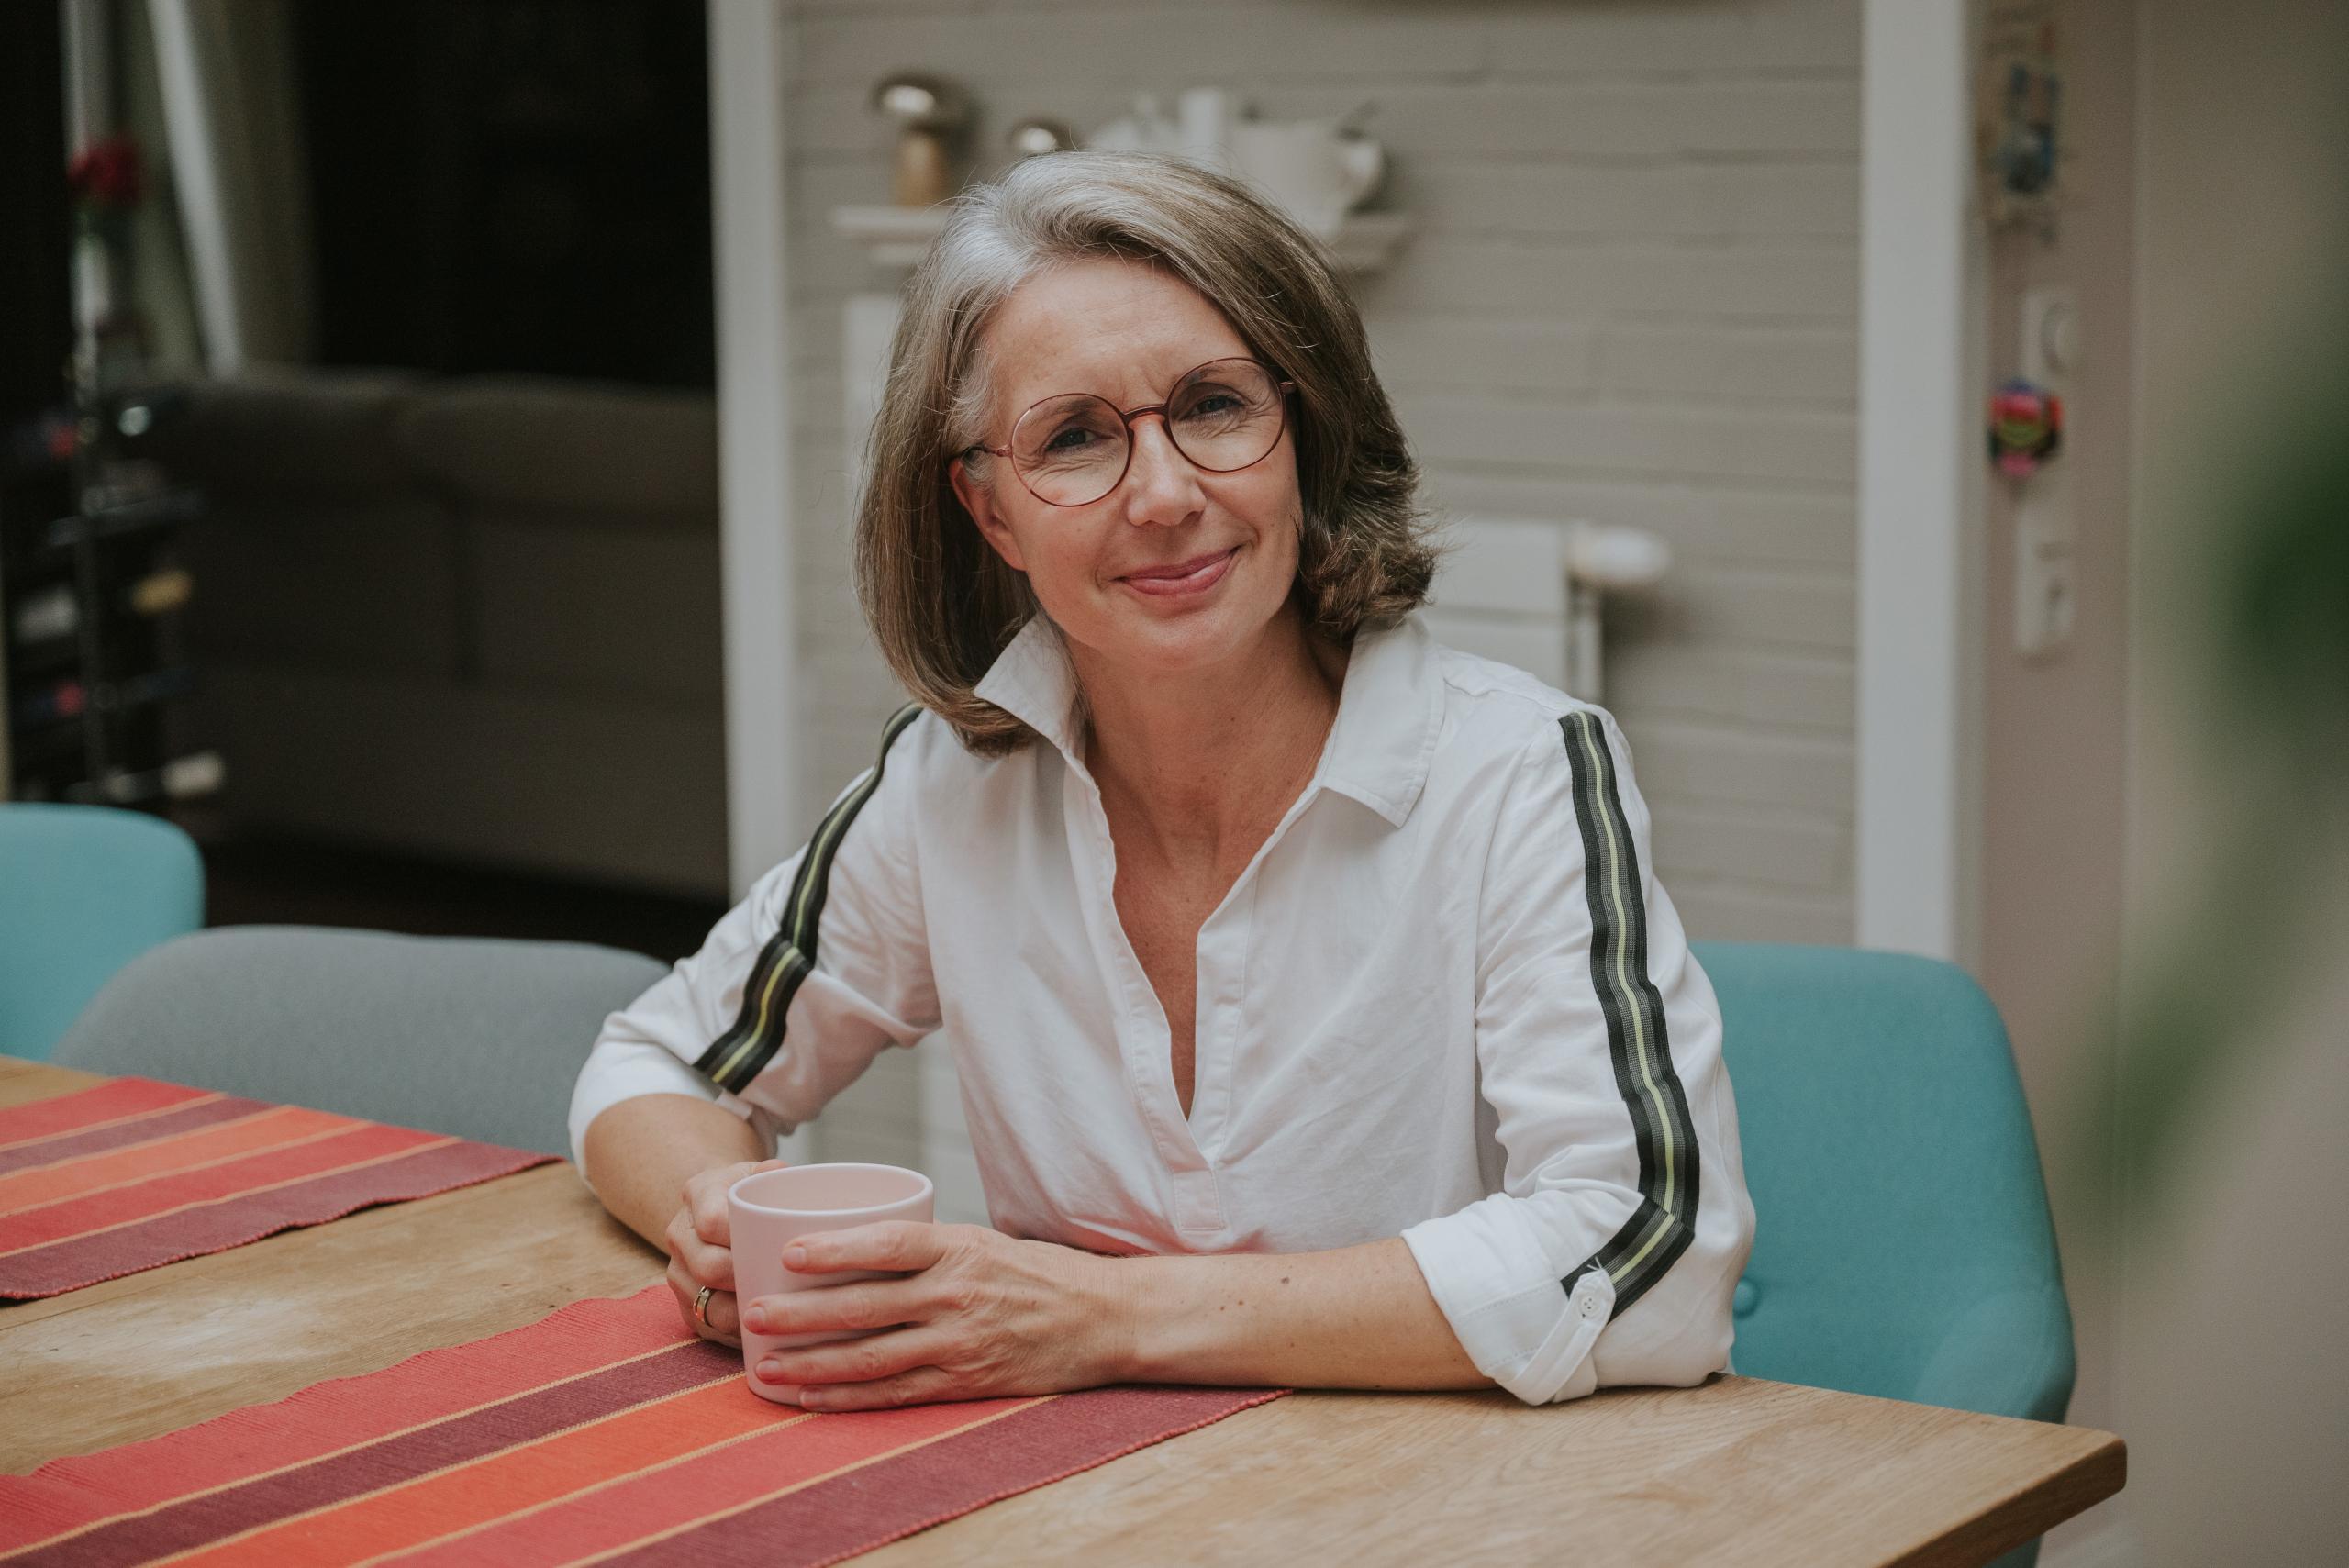 Cornelia Levin-Geldermann